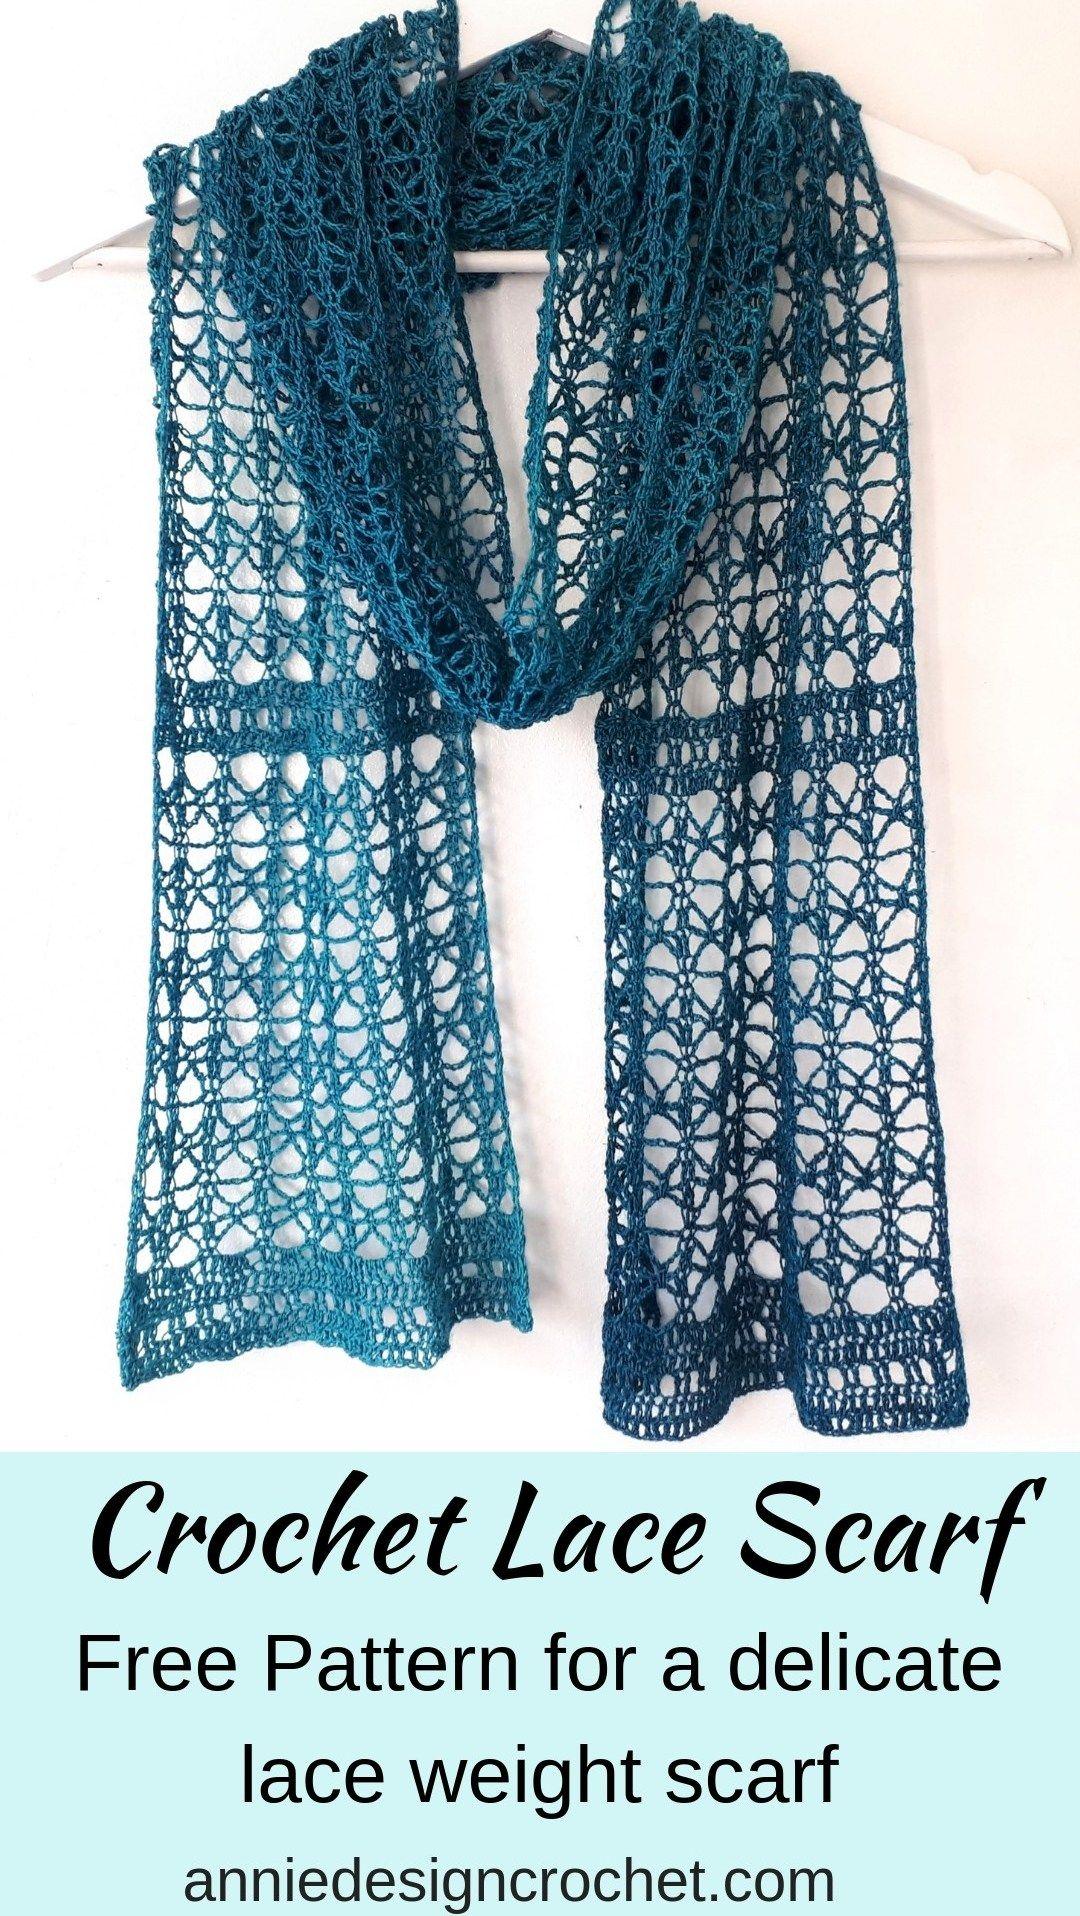 Rosaline – Free Crochet Pattern for a Delicate Lace Scarf – Annie Design Crochet